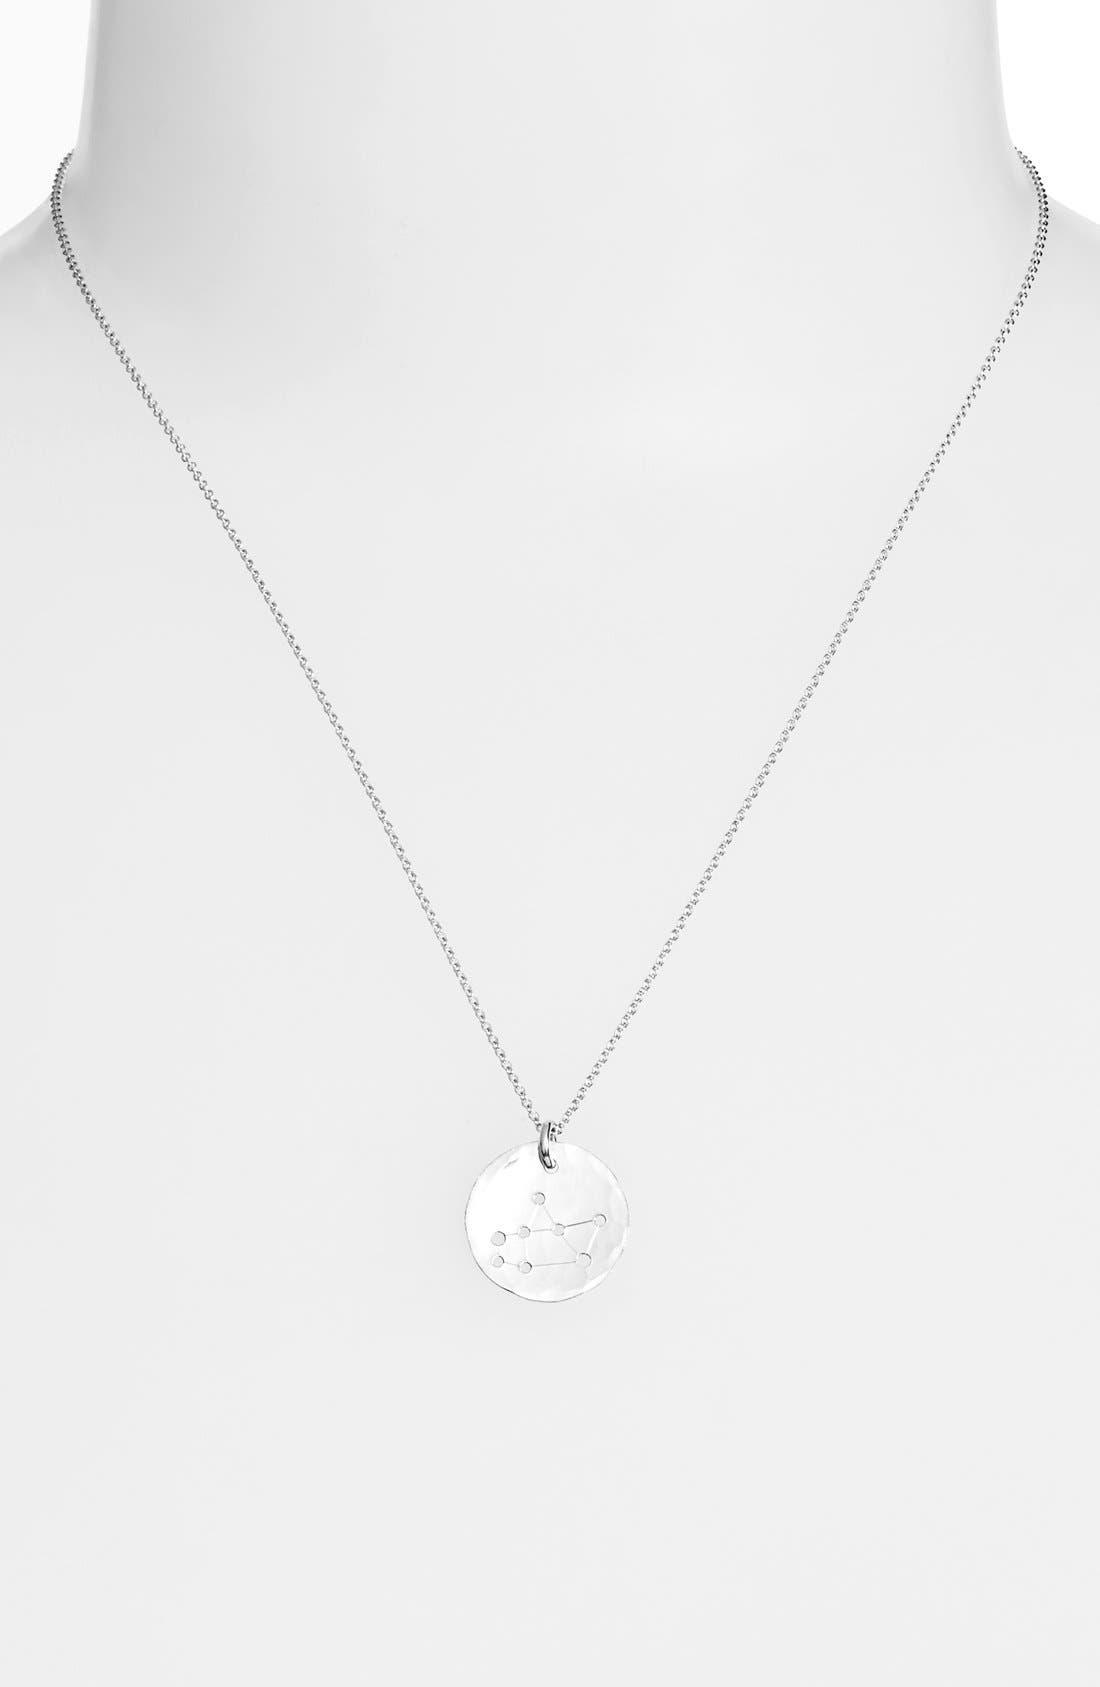 Ija 'Small Zodiac' Sterling Silver Necklace,                             Main thumbnail 9, color,